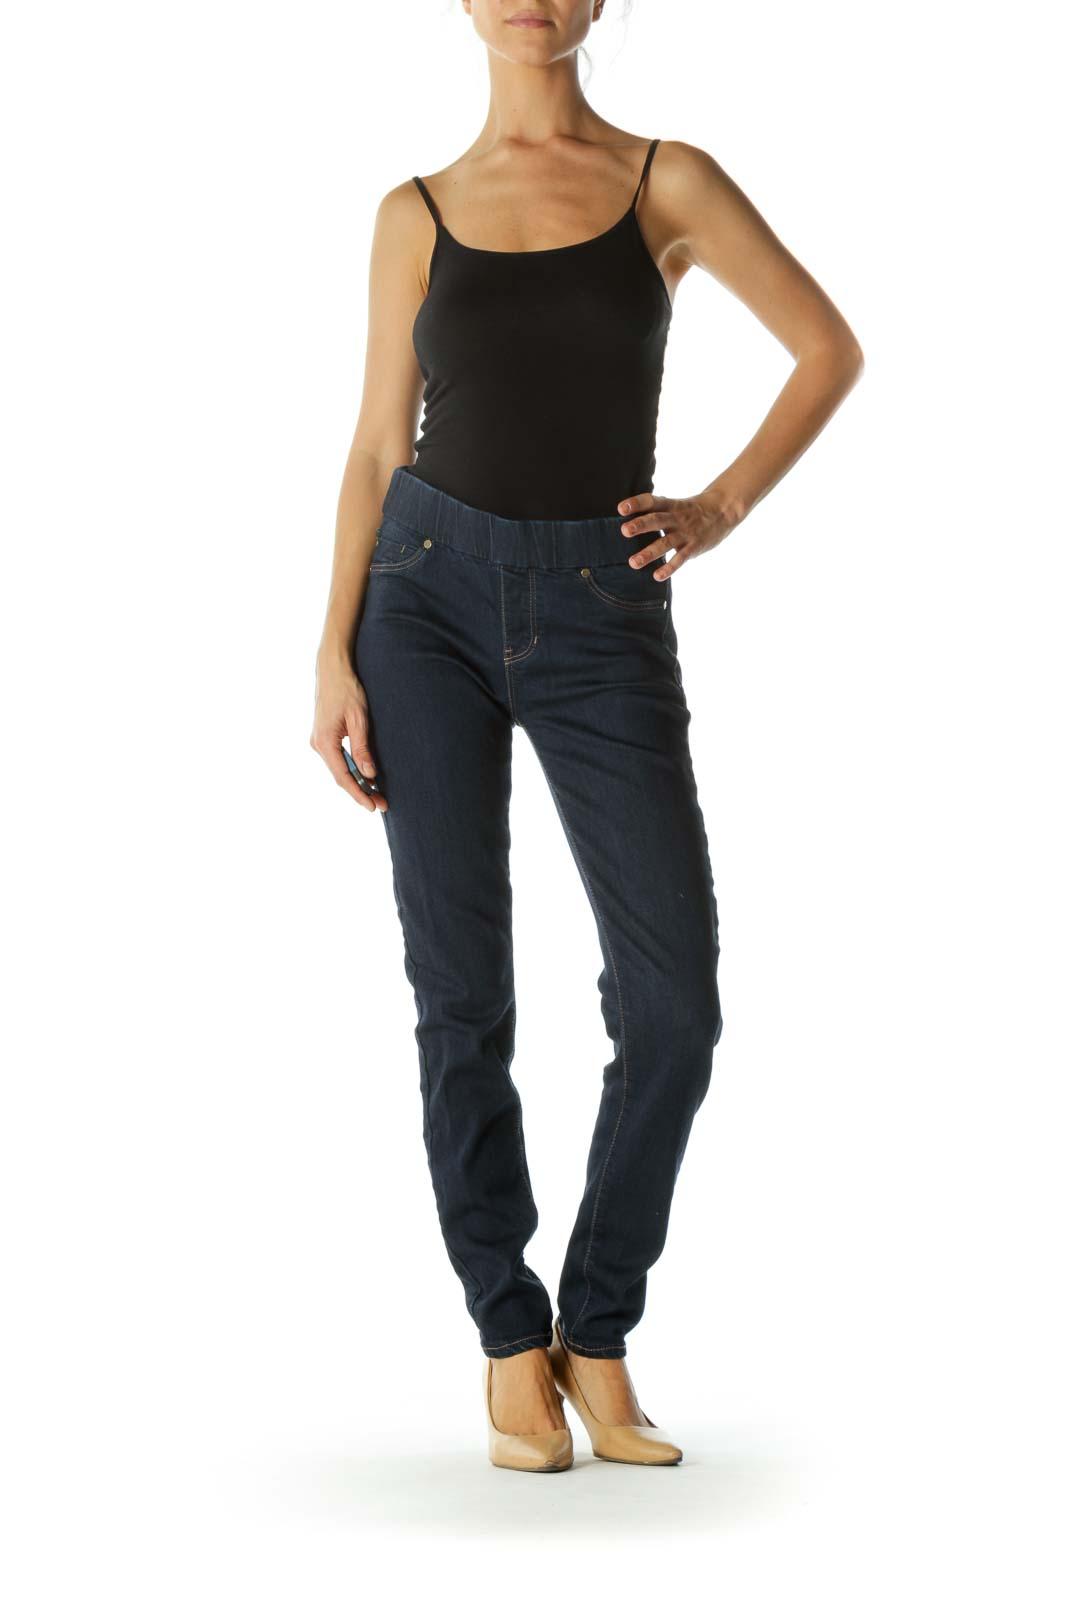 Blue Dark-Wash Elastic Waist-Band Faux-Front-Pockets Denim Legging